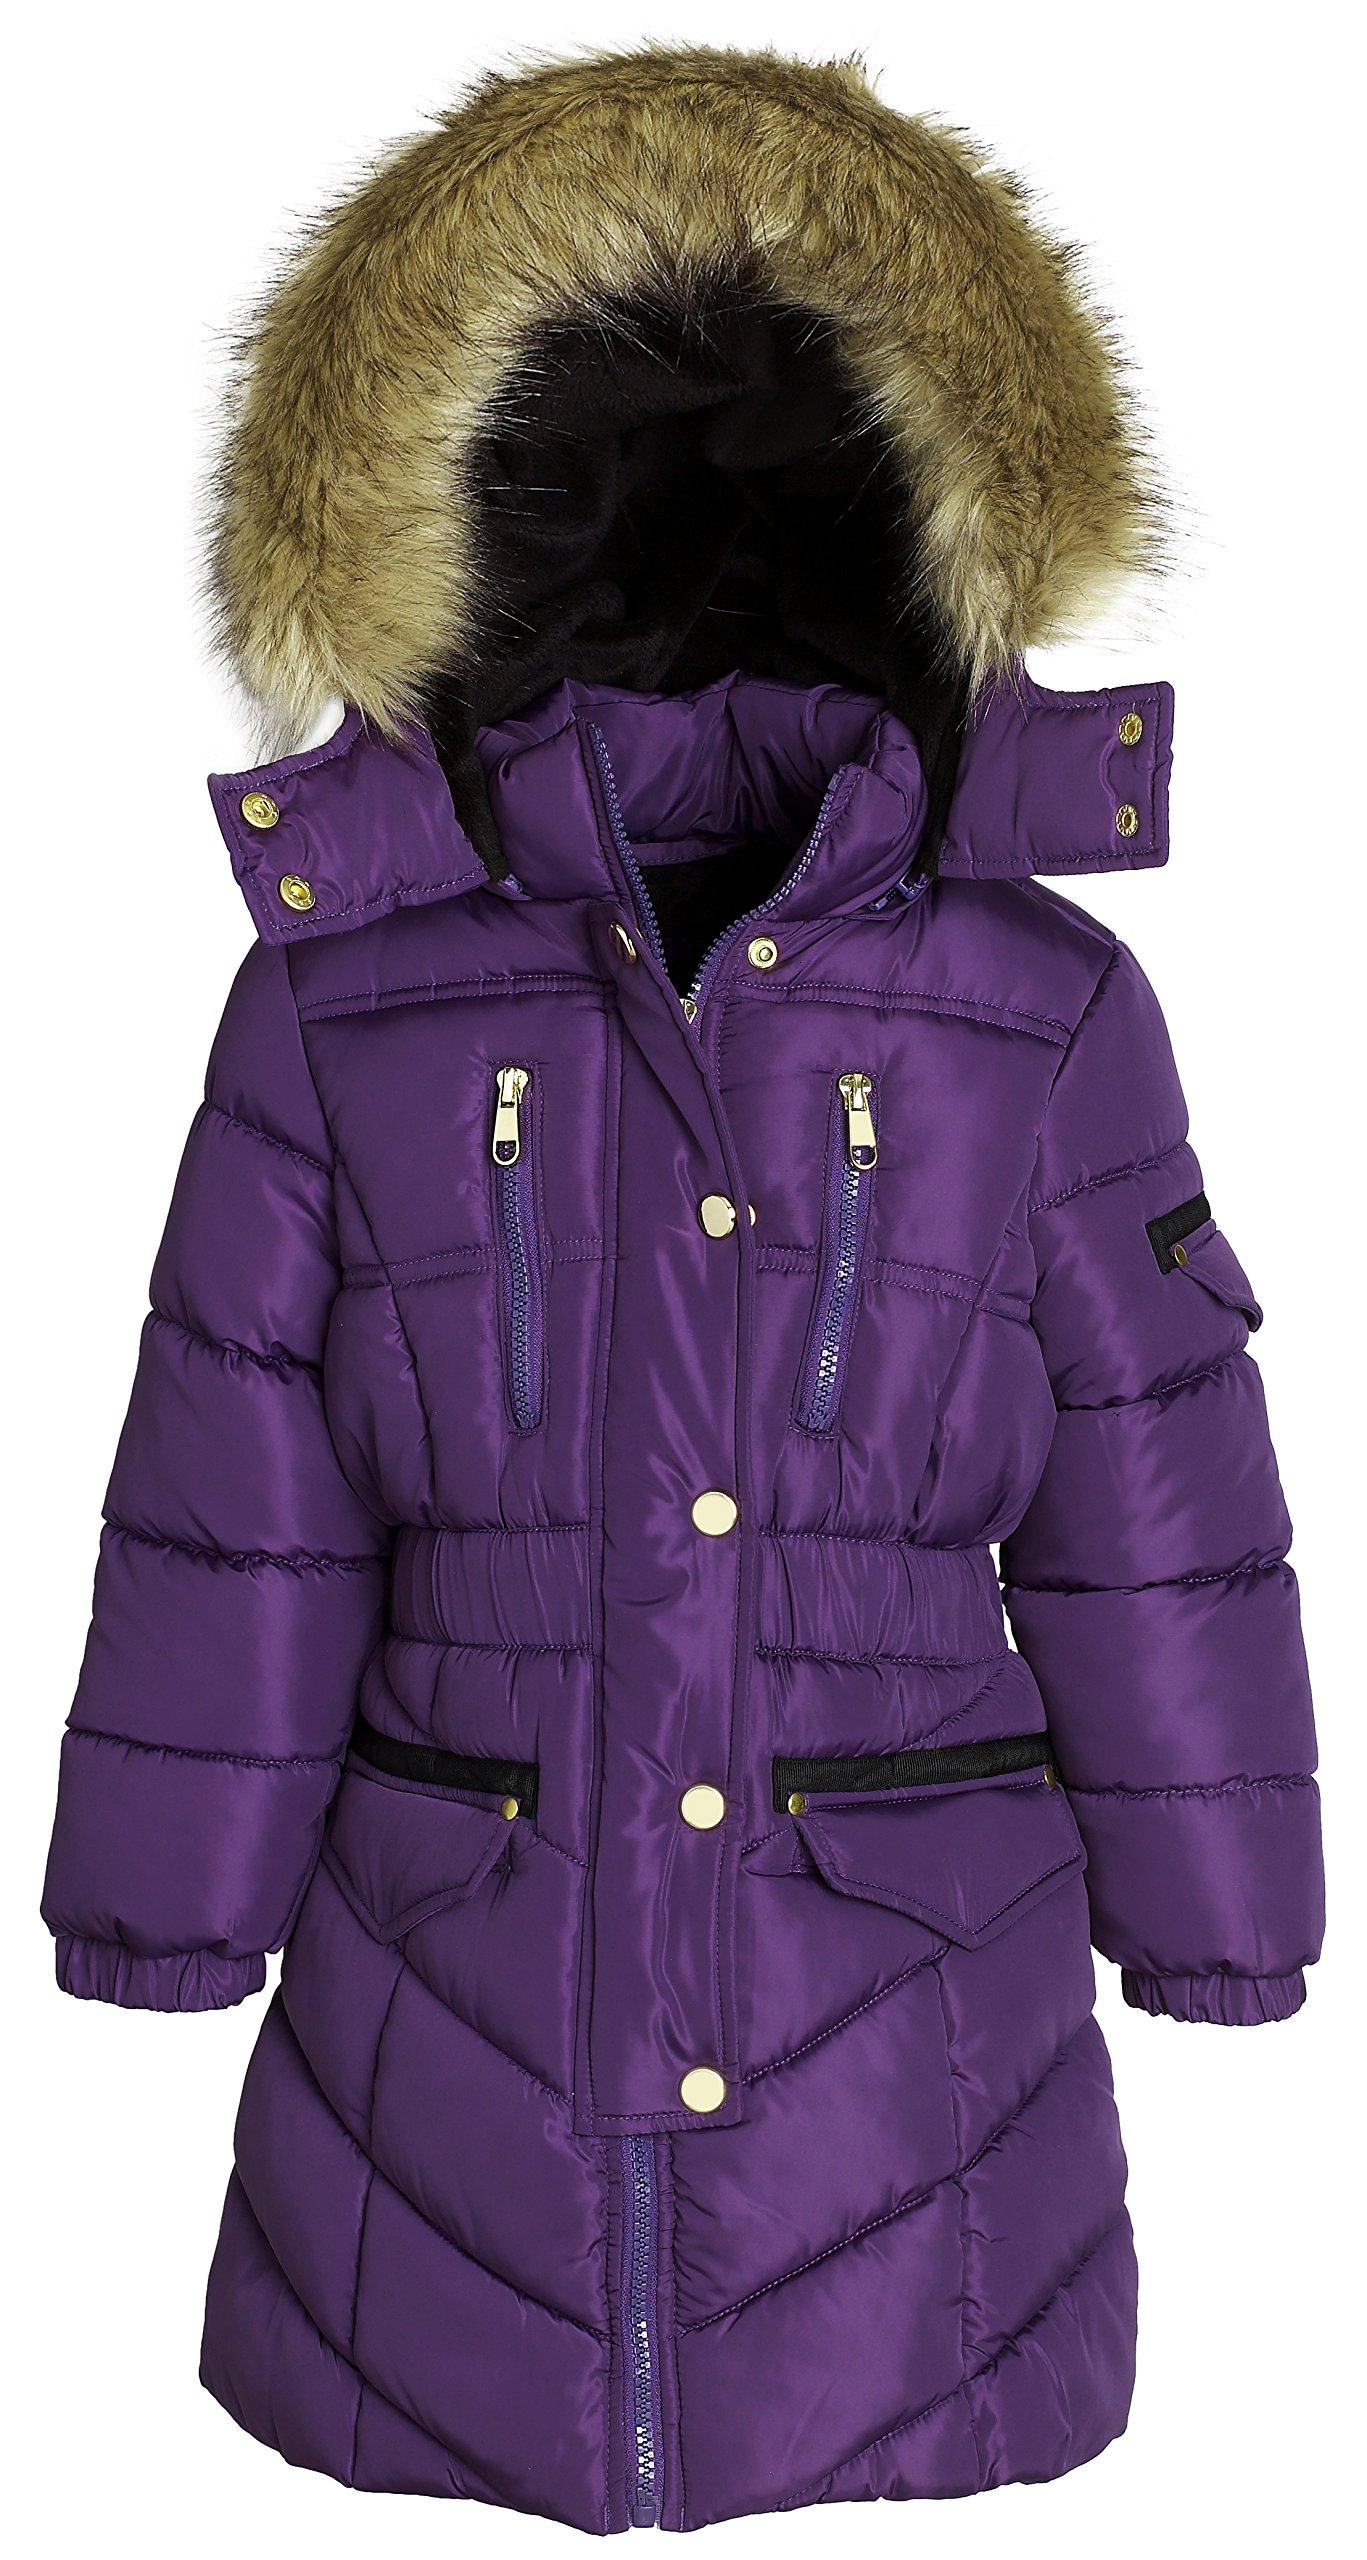 Sportoli Girls' Winter Heavy Quilt Padded Puffer Jacket Plush Lined Hooded Coat (Purple, 14/16)